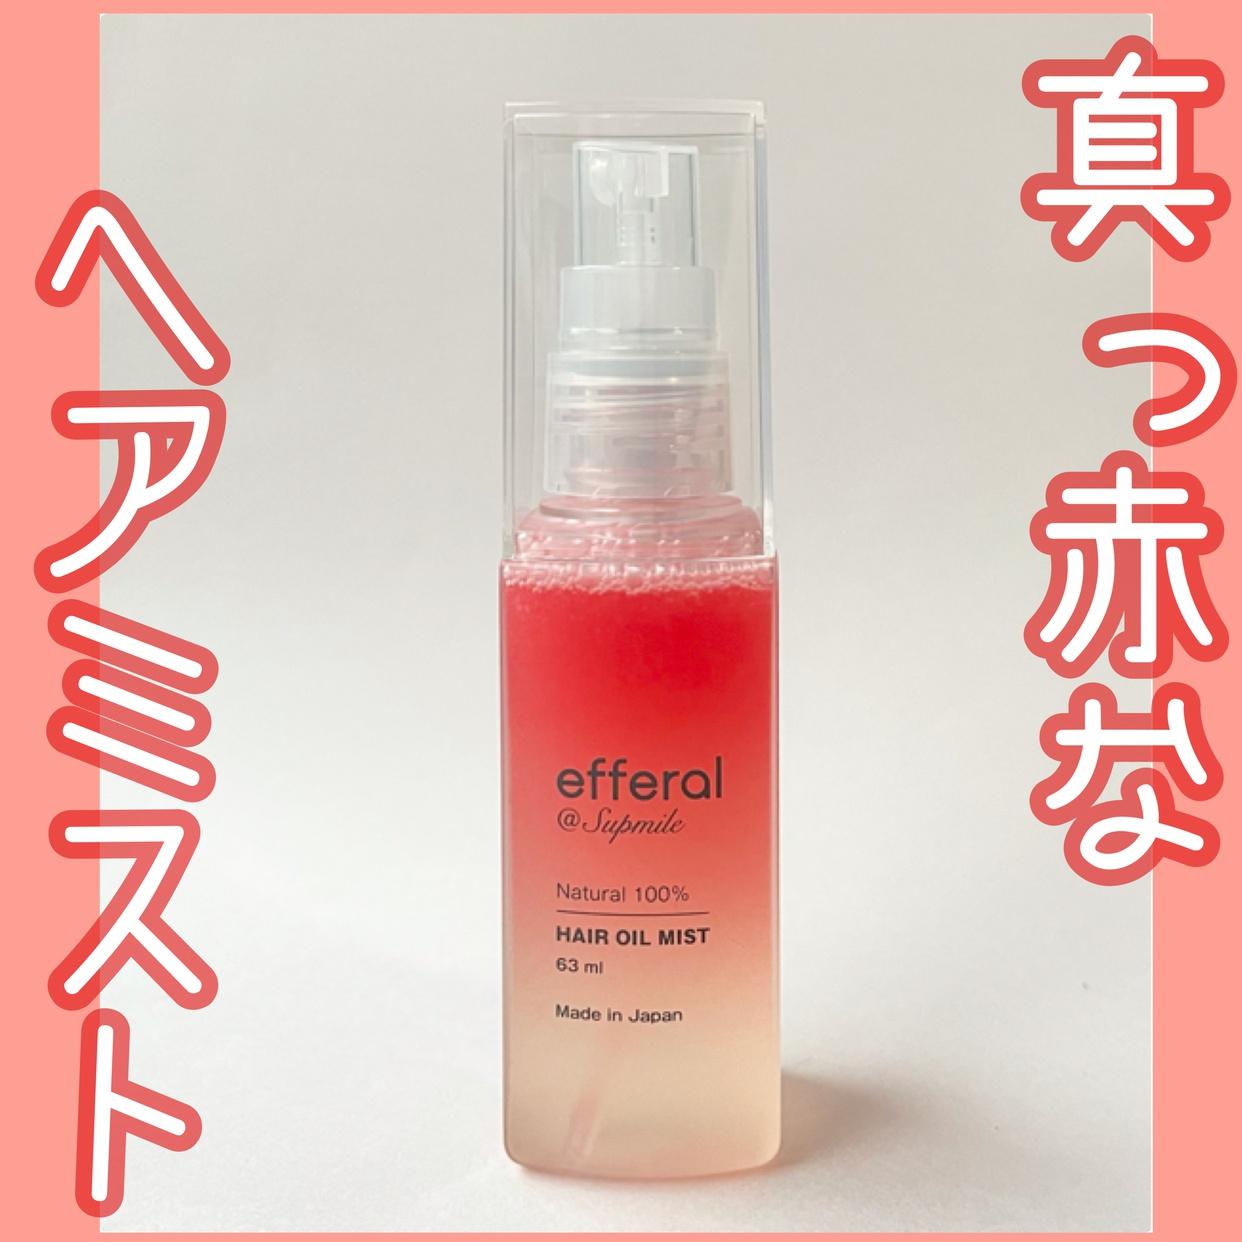 efferal(エフェラル)ヘアオイルミストを使ったあひるさんのクチコミ画像1